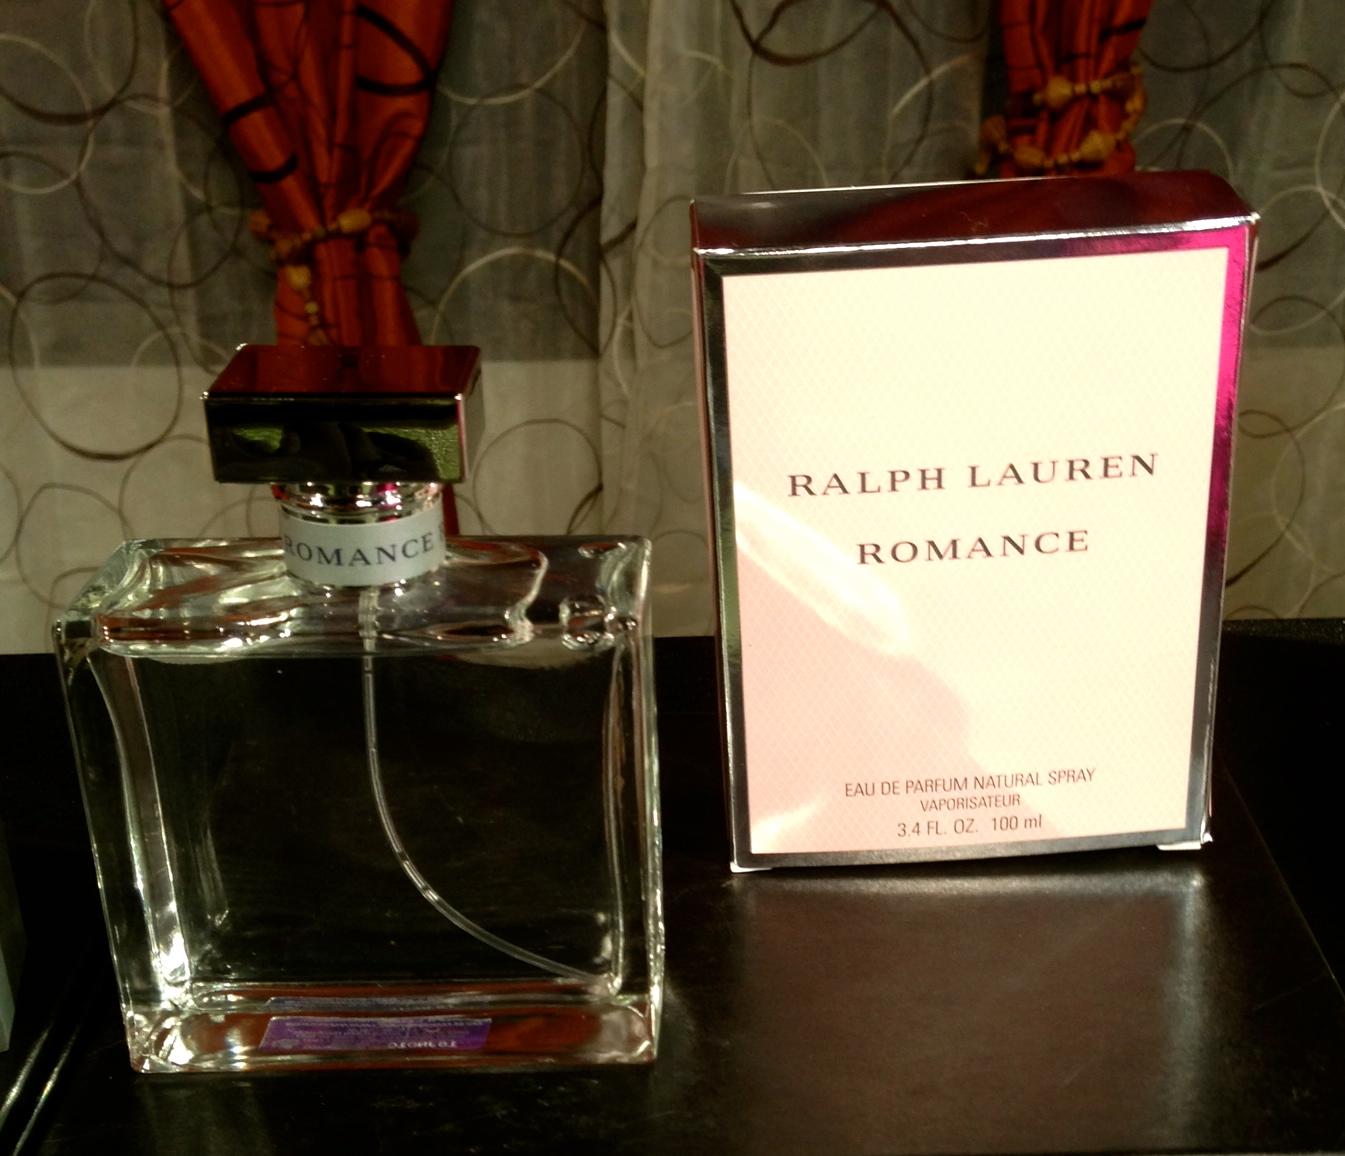 ralph lauren romance fragrancse